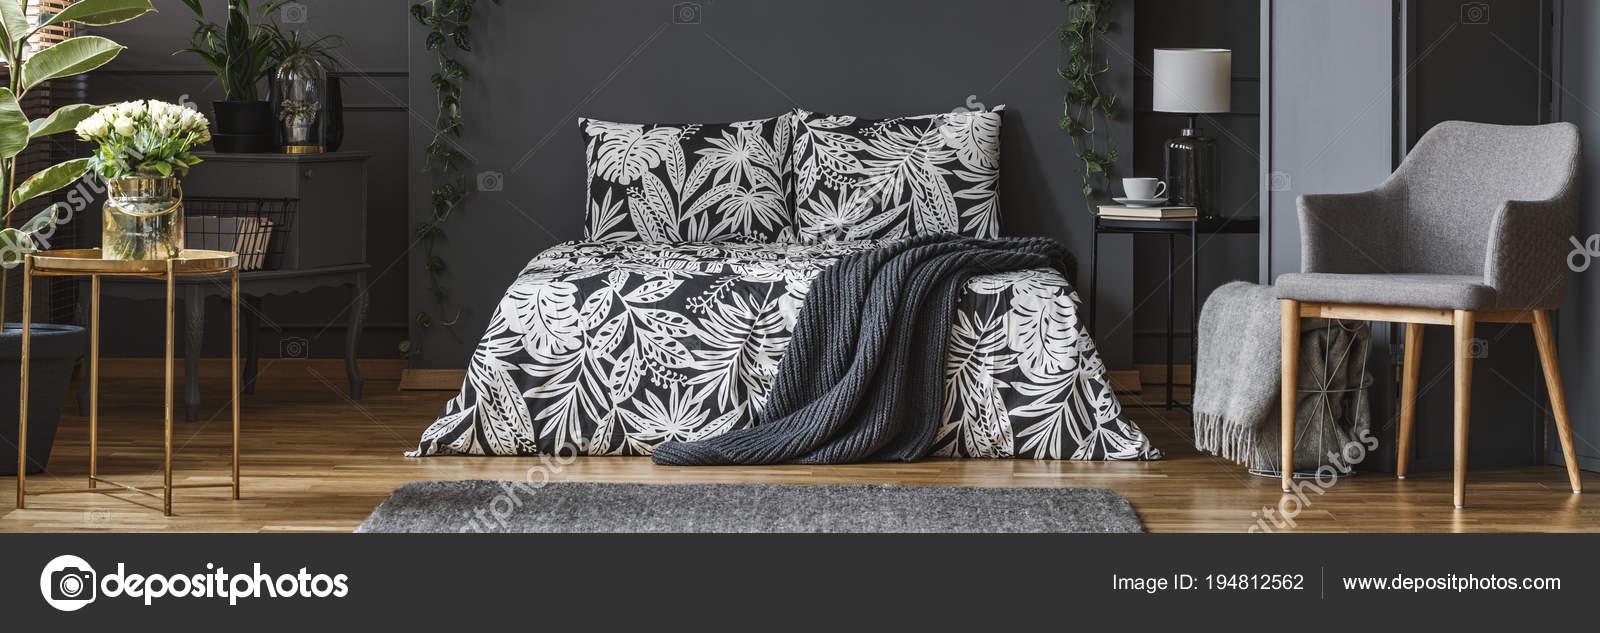 donkere slaapkamer met florale bed stockfoto